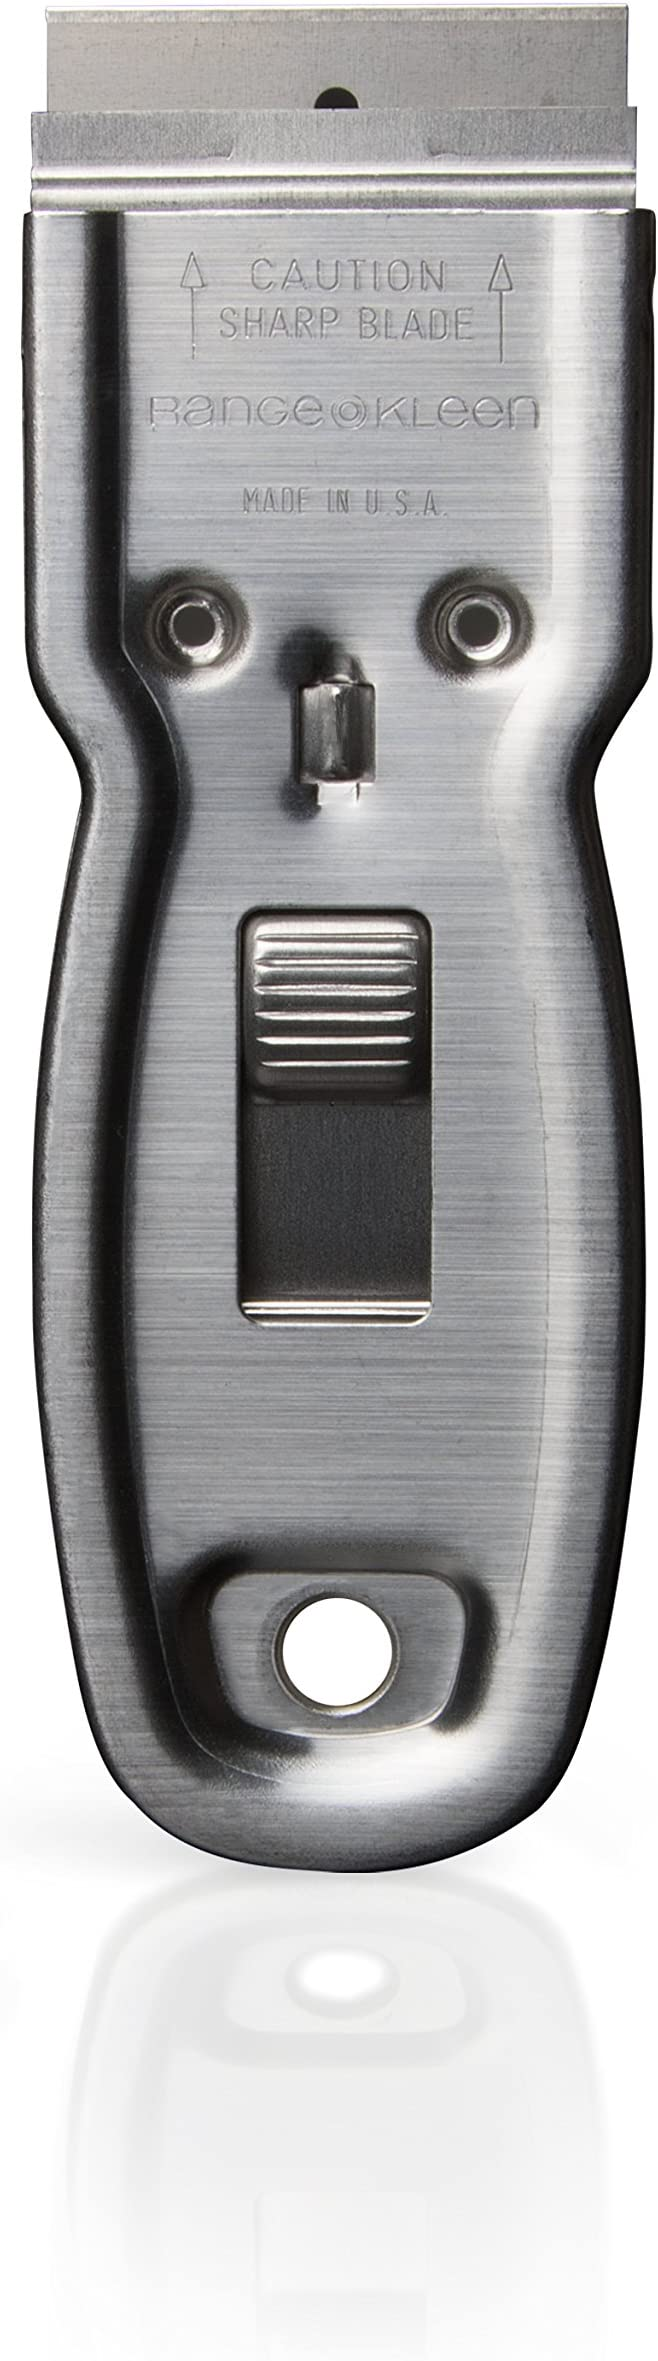 Amazon.com: Range Kleen 686 Range Kleen suave gama superior ...